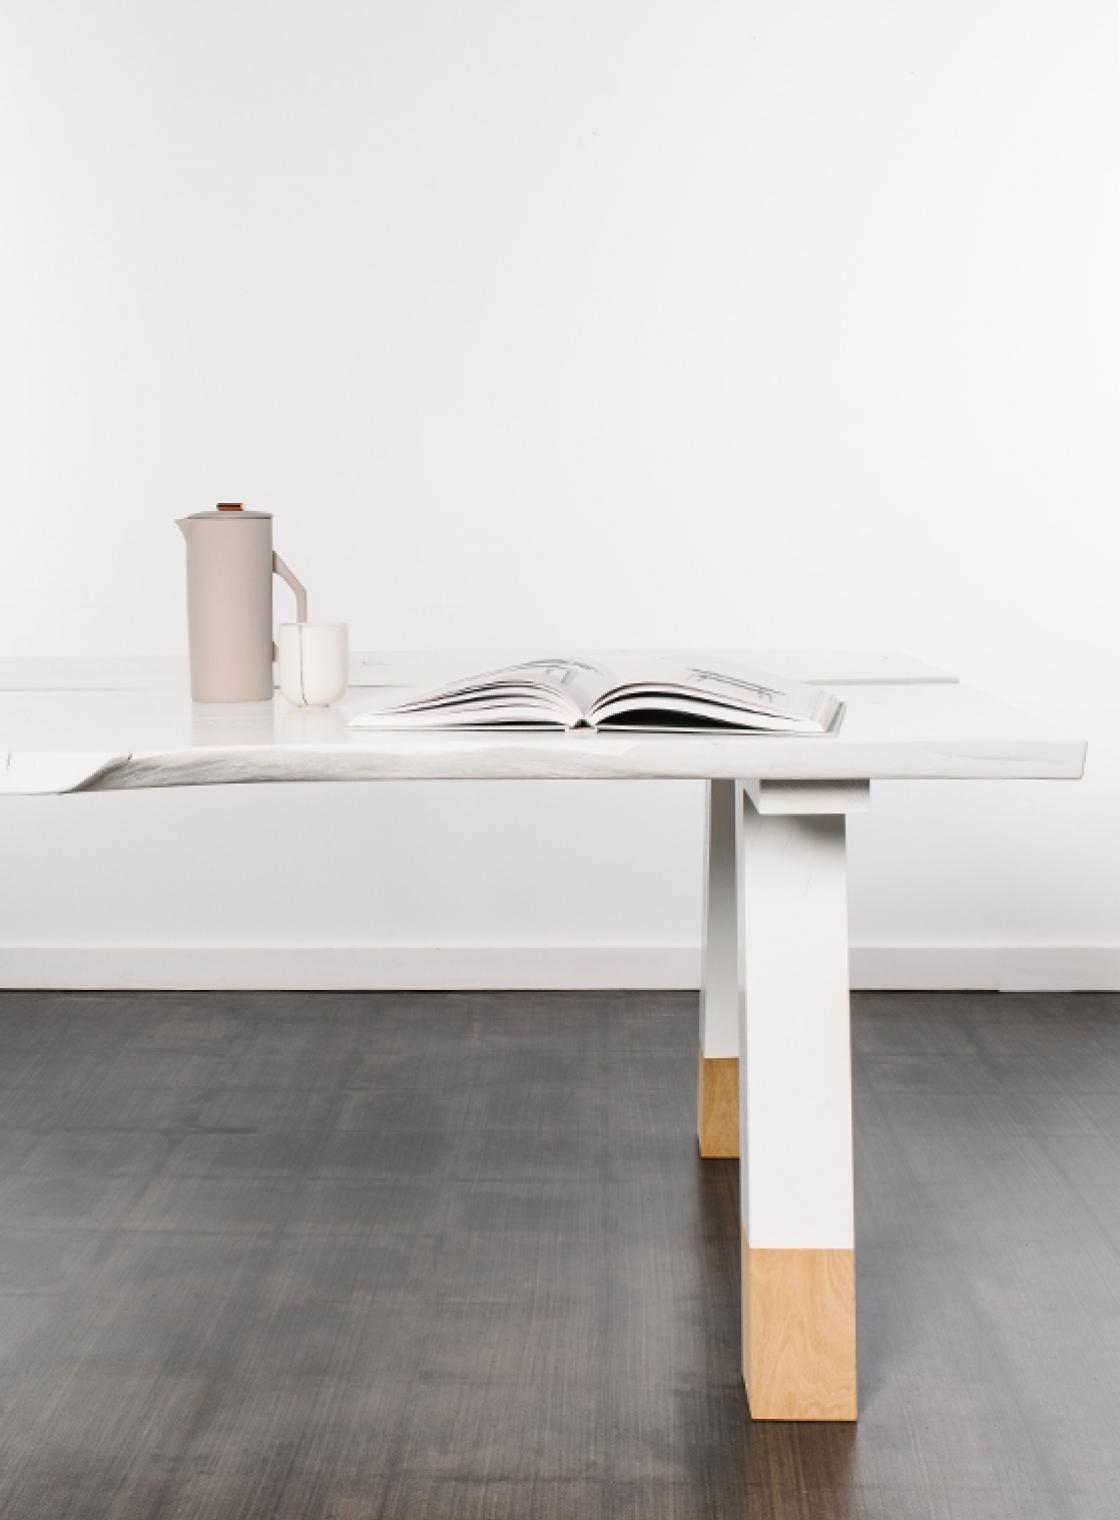 Skylar Morgan Furniture + Design